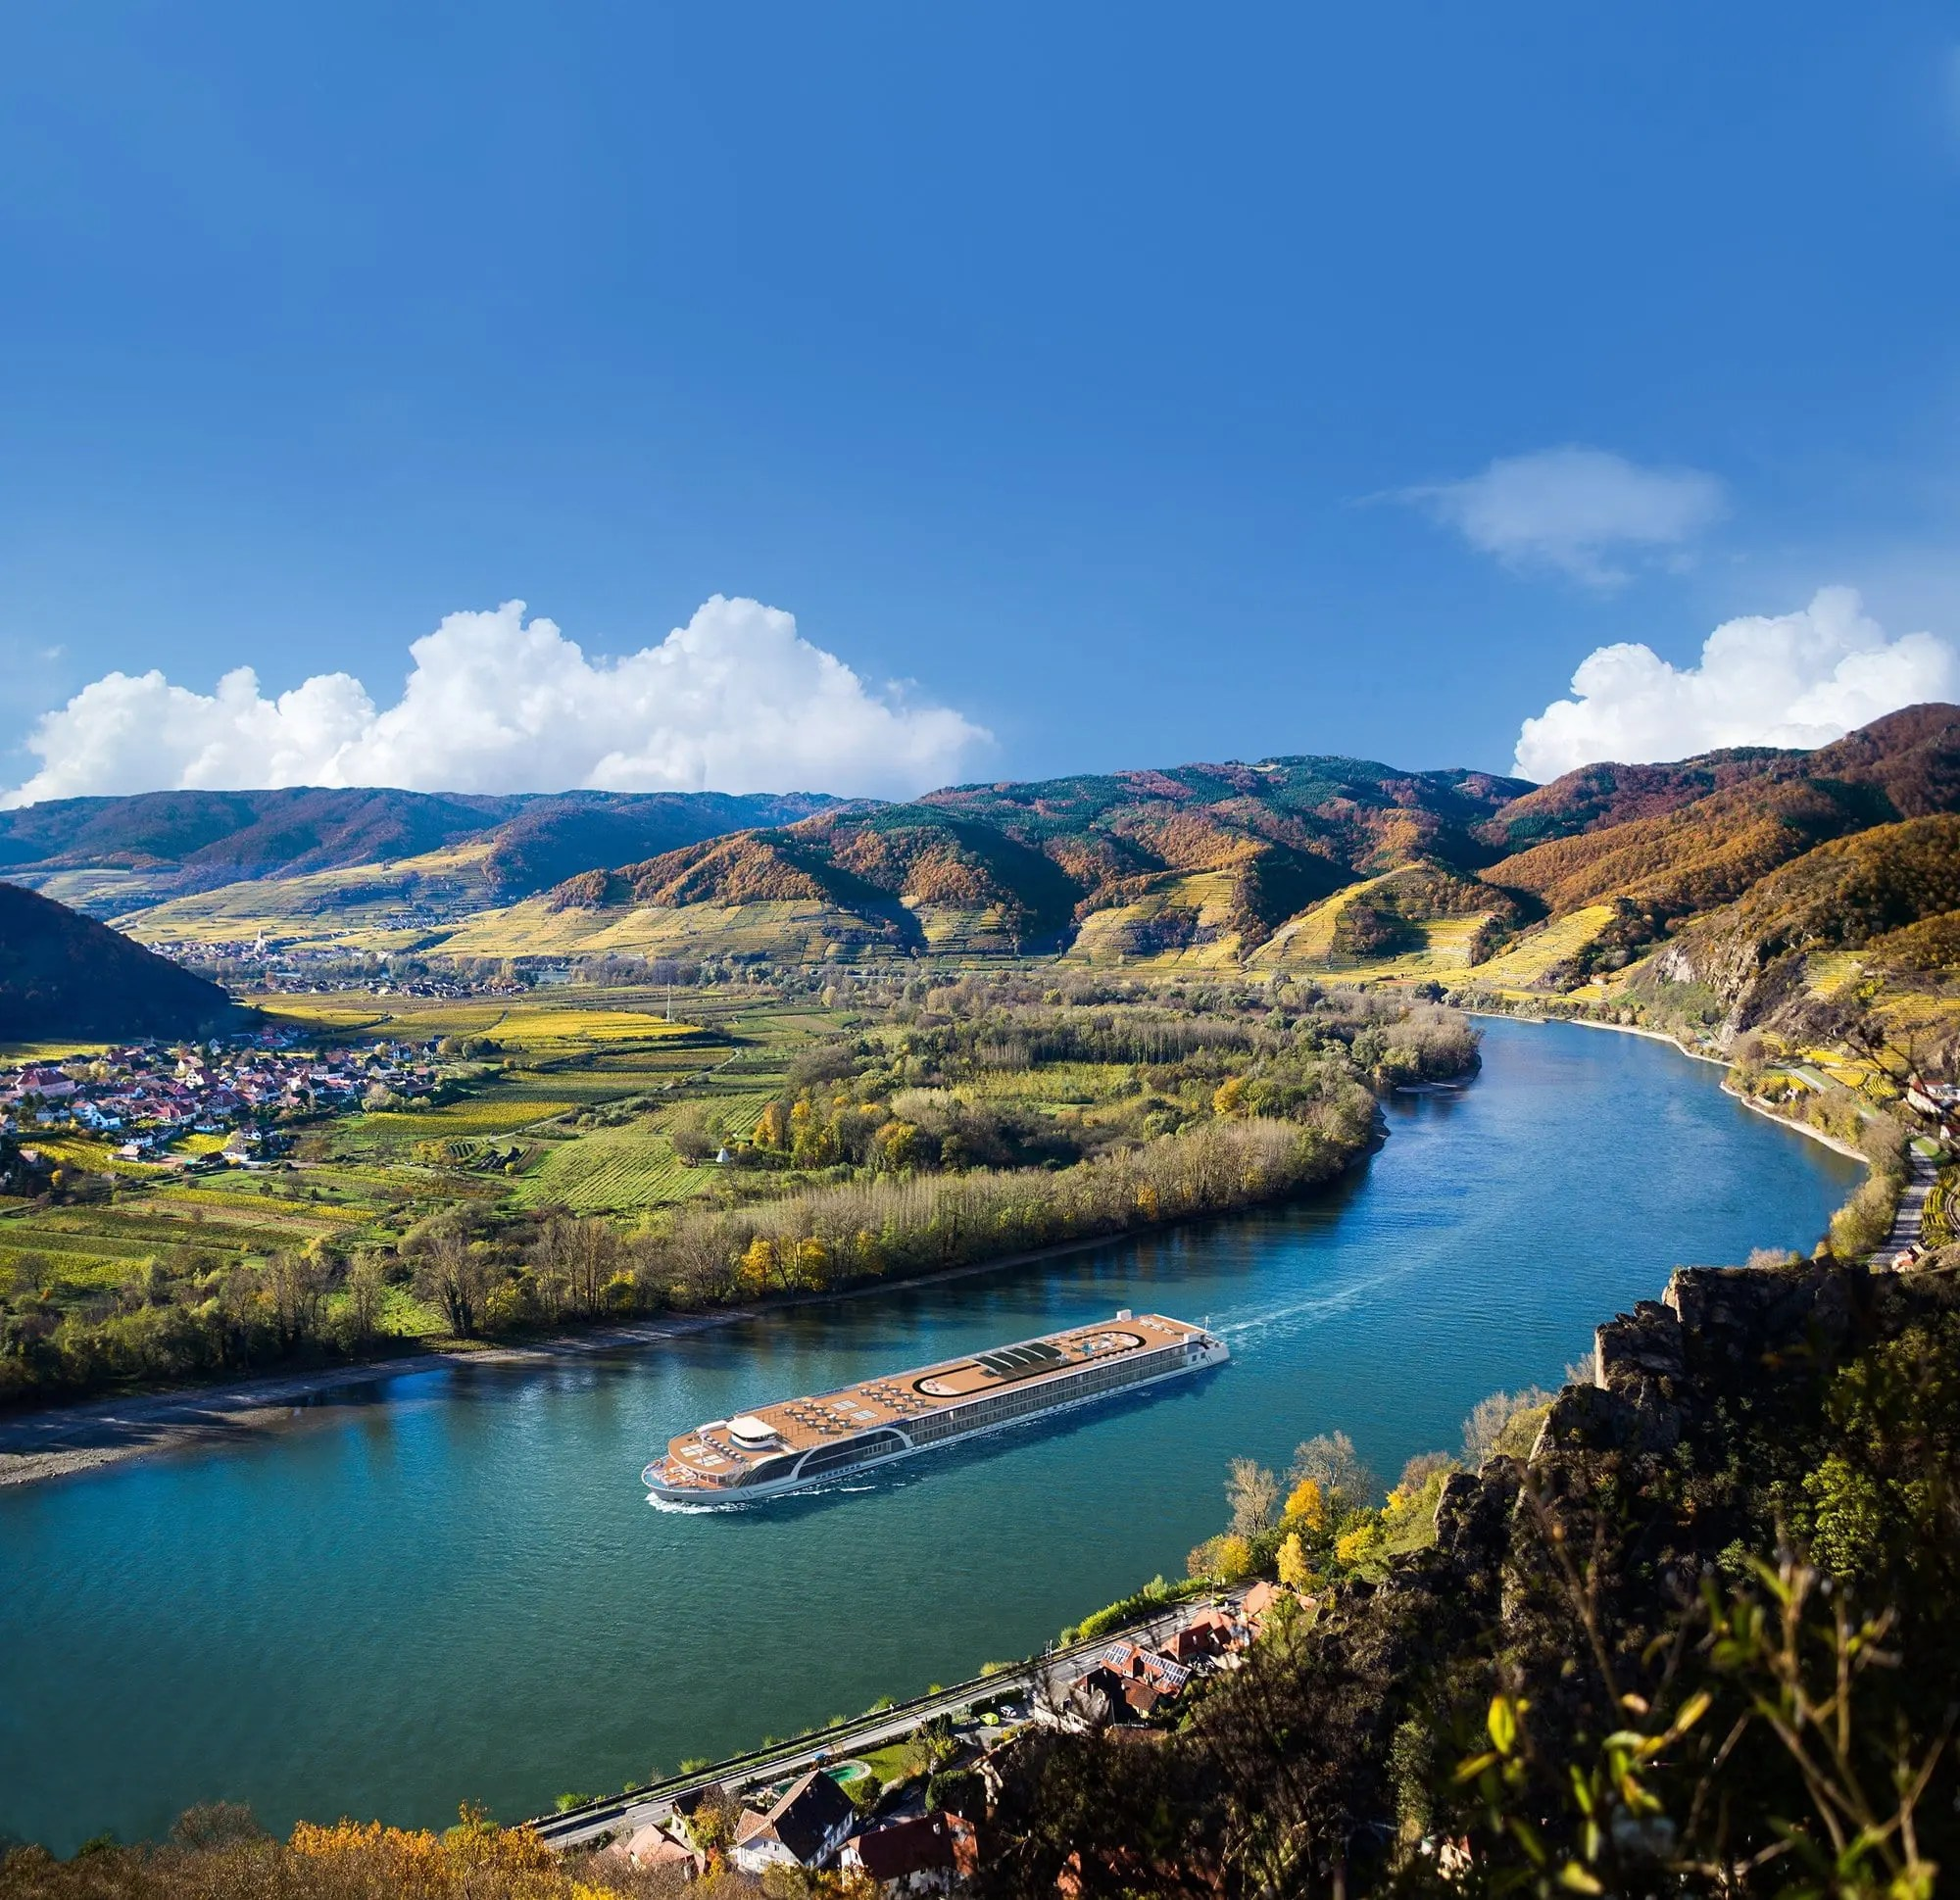 AmaMagna on the Danube